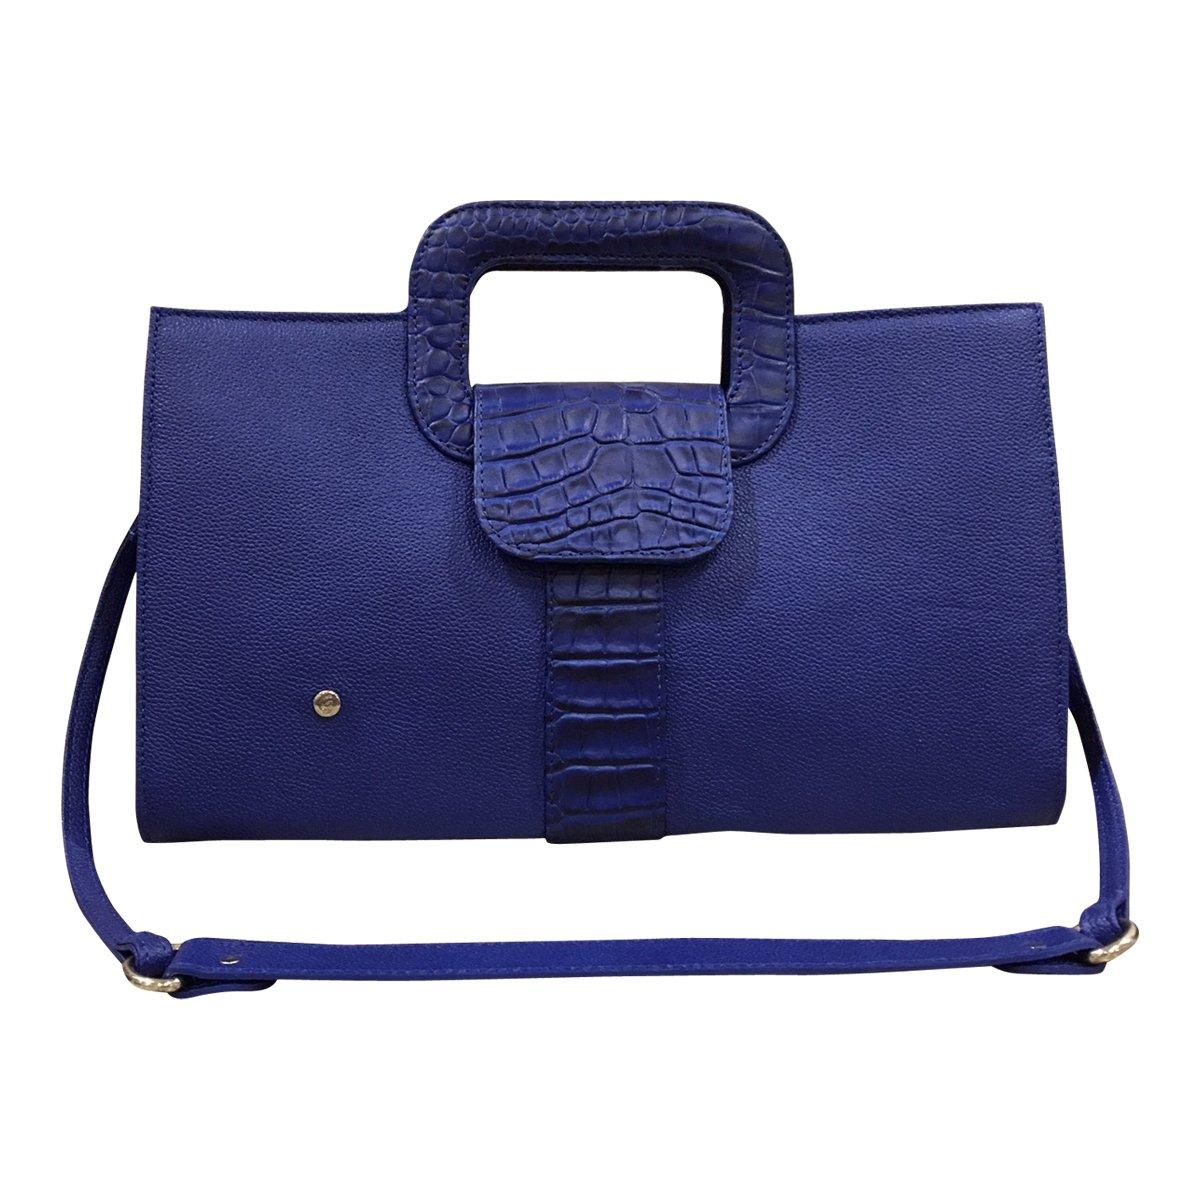 Gaspy Elena Women's Formal Evening Handbag, 100 Percent Colombian Leather (Royal Blue, Granular and Gavial Crocodile Patterns)